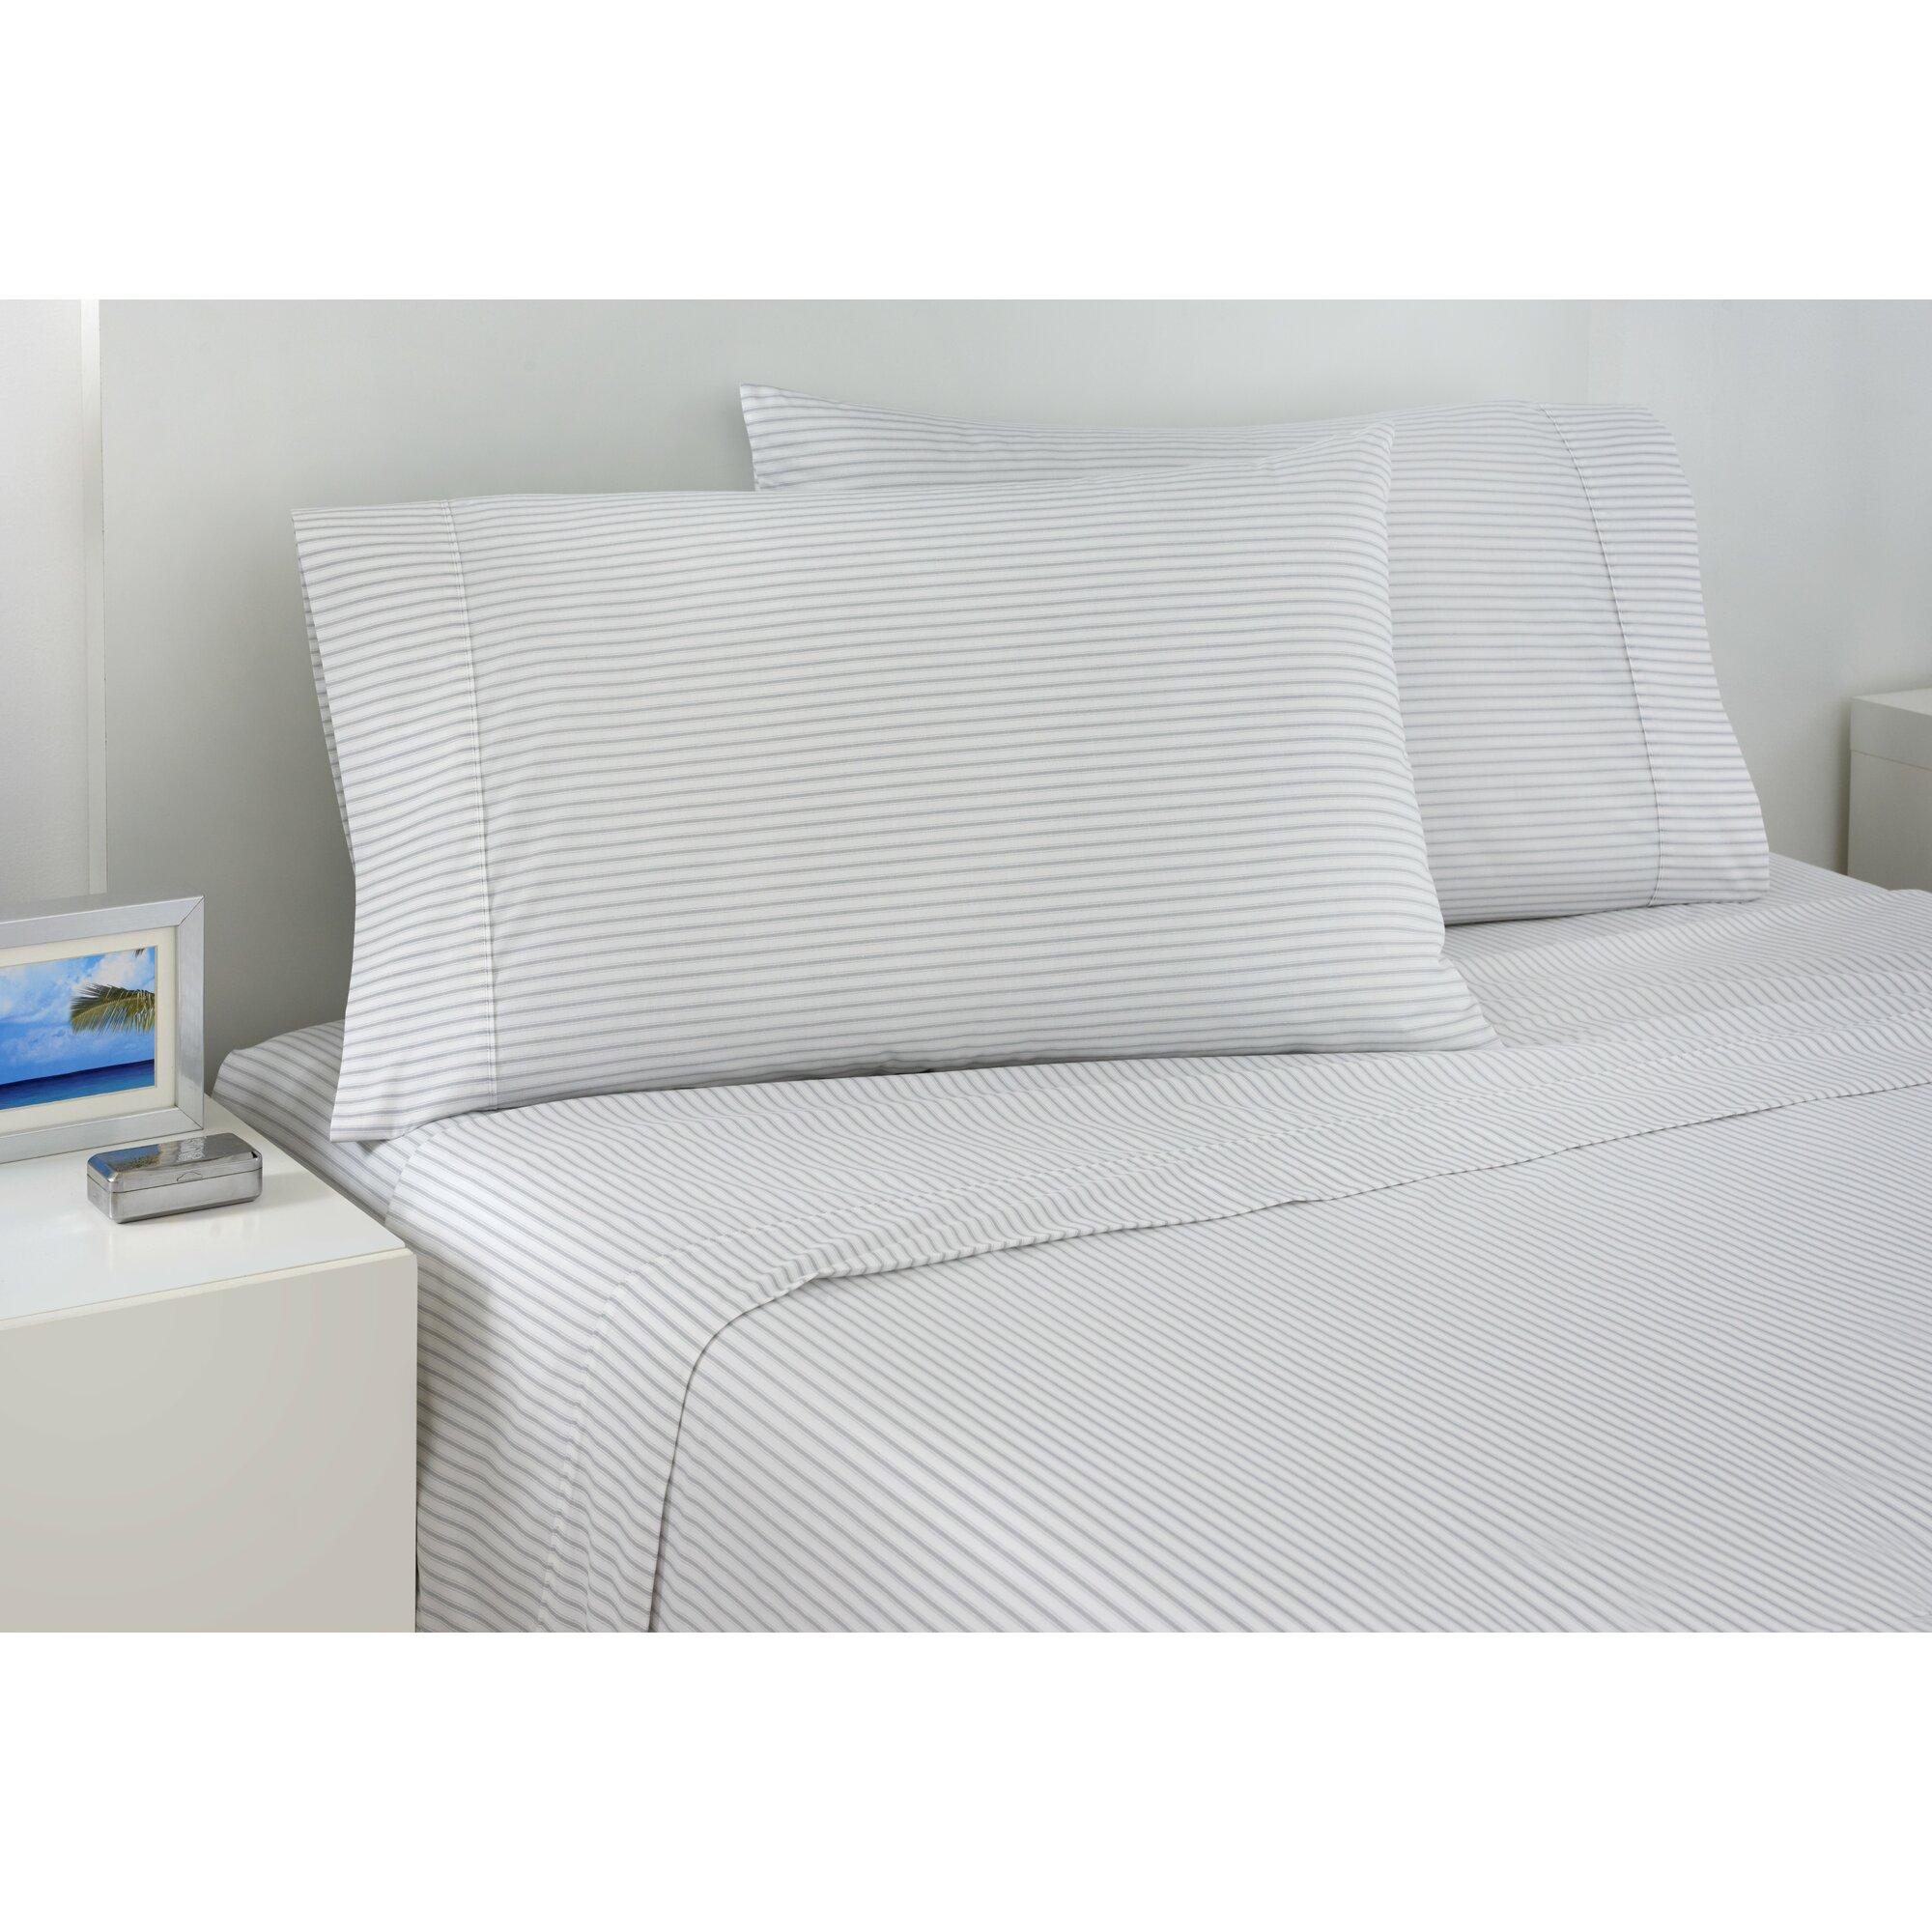 izod 200 thread count ticking stripe sheet set reviews wayfair. Black Bedroom Furniture Sets. Home Design Ideas